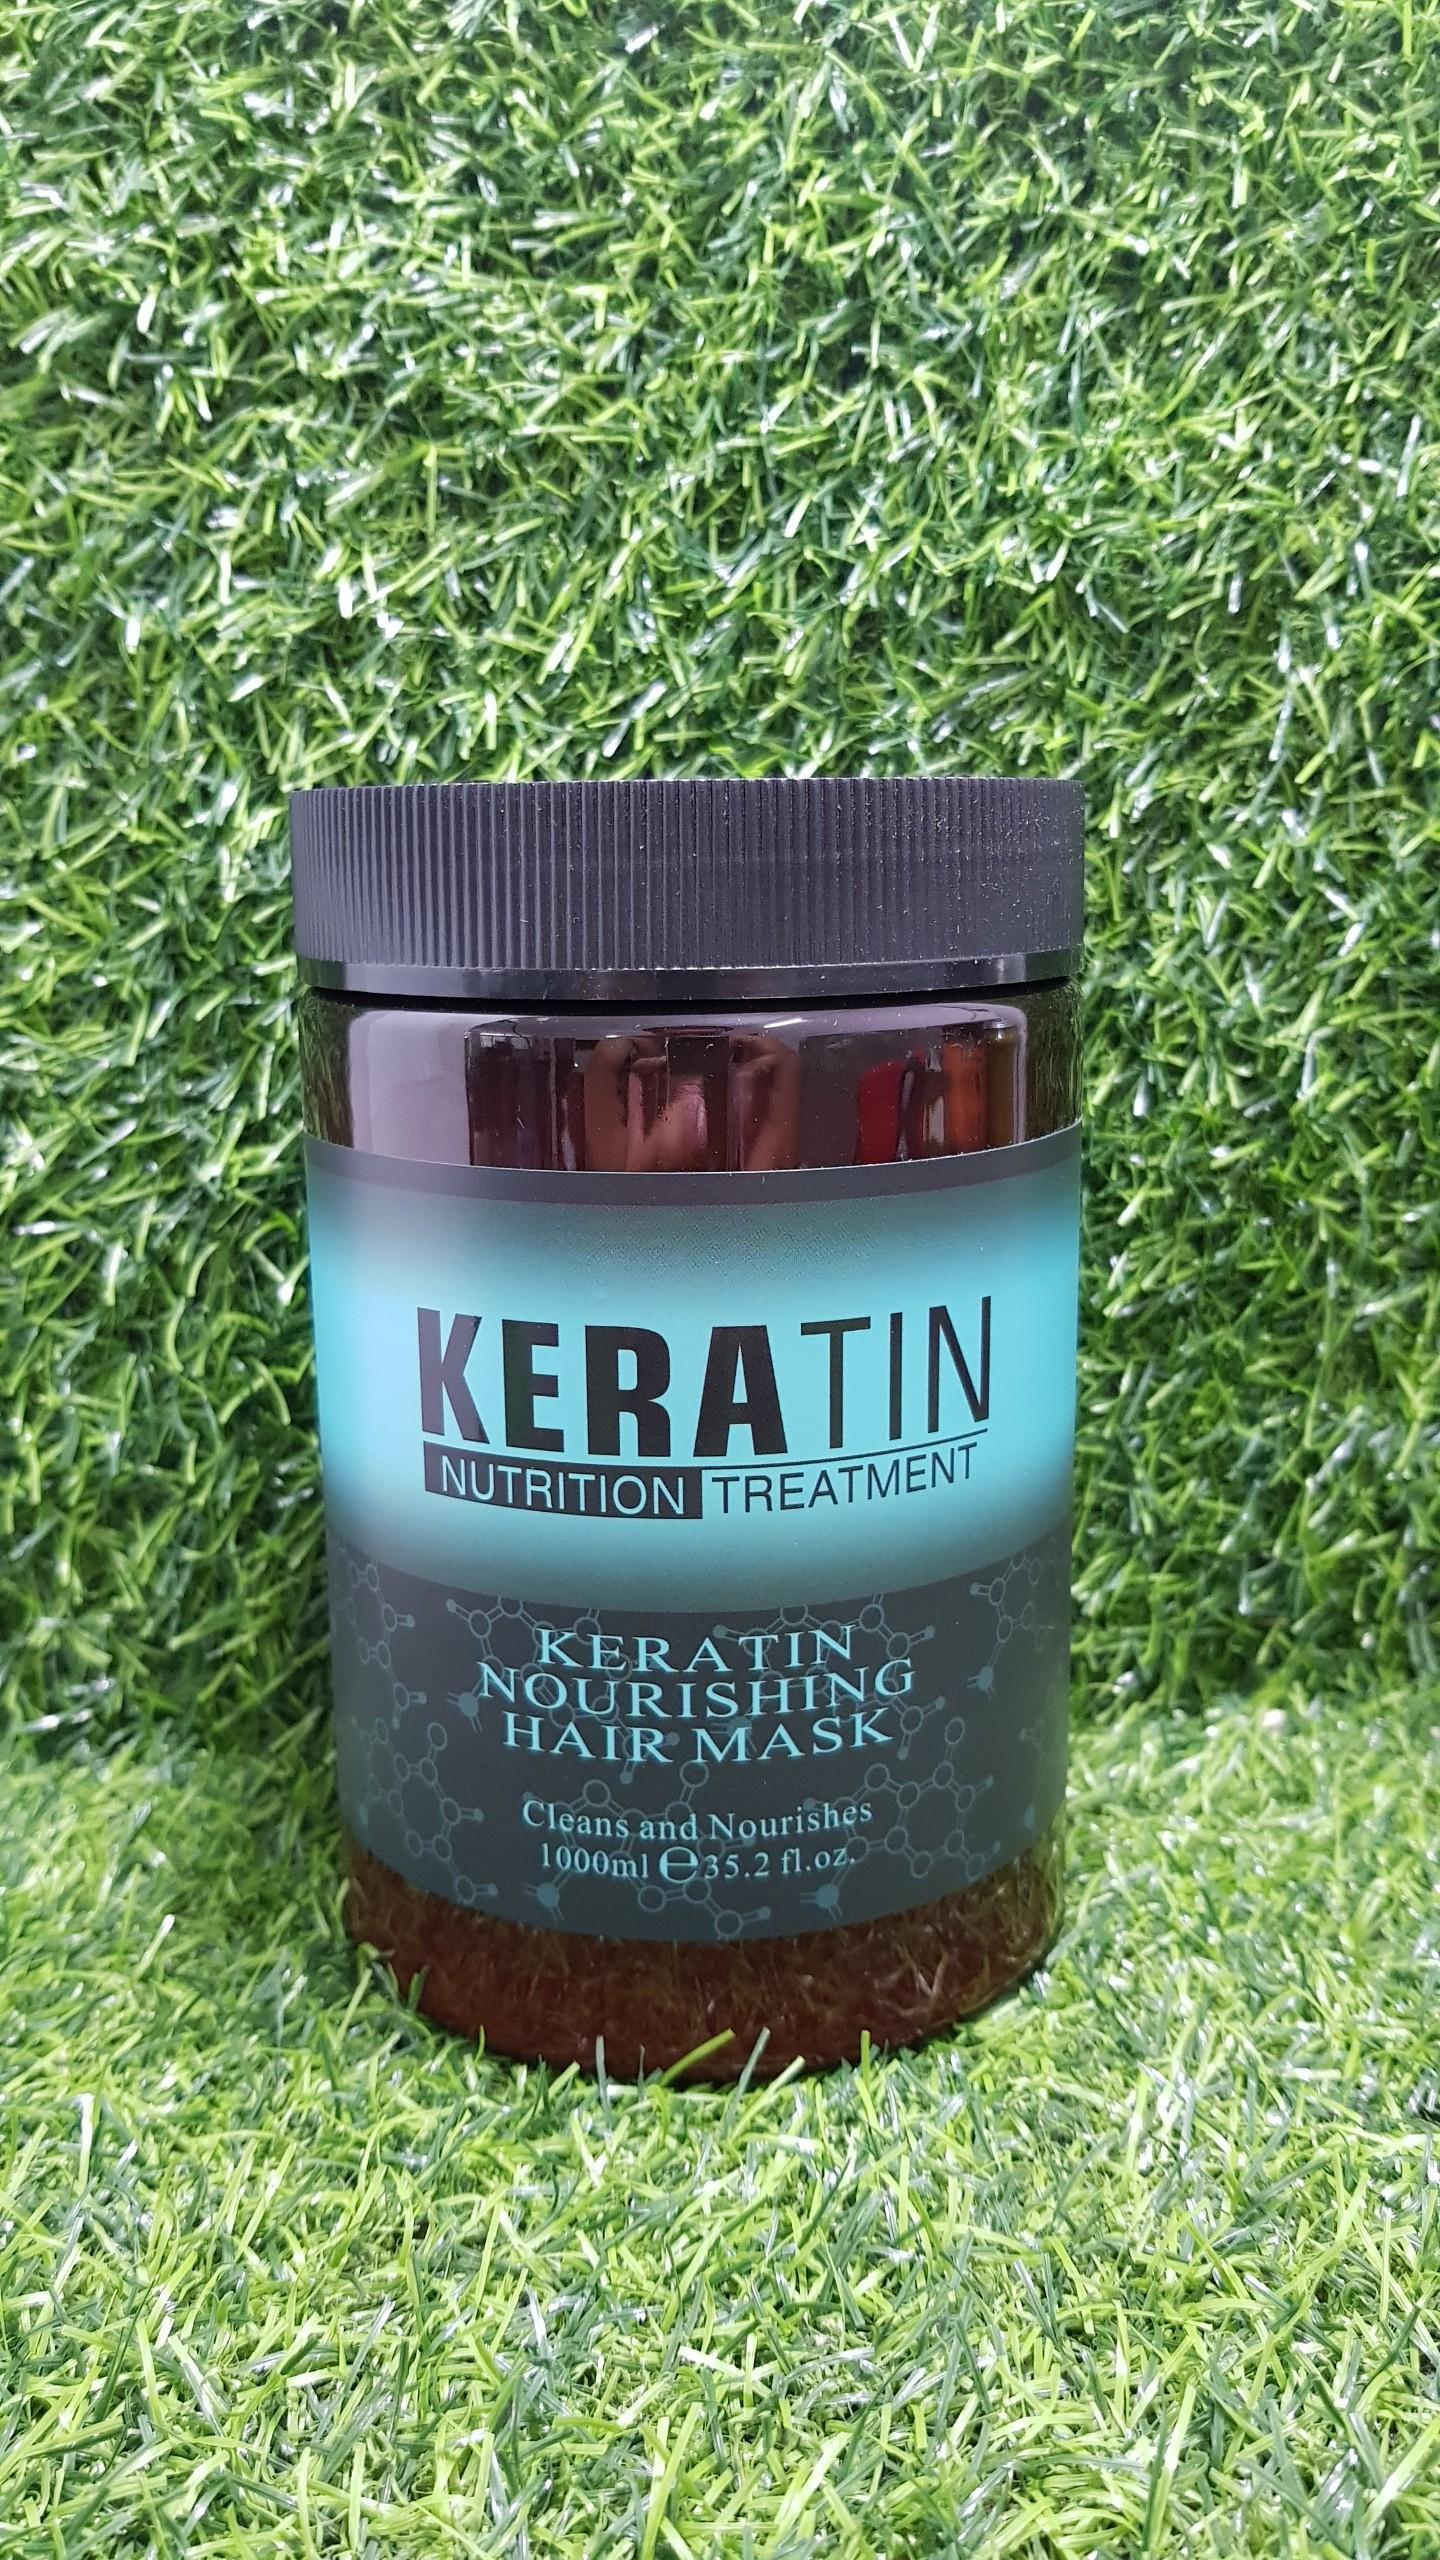 Kem ủ tóc phục hồi Keratin Nutrition Treatment 1000